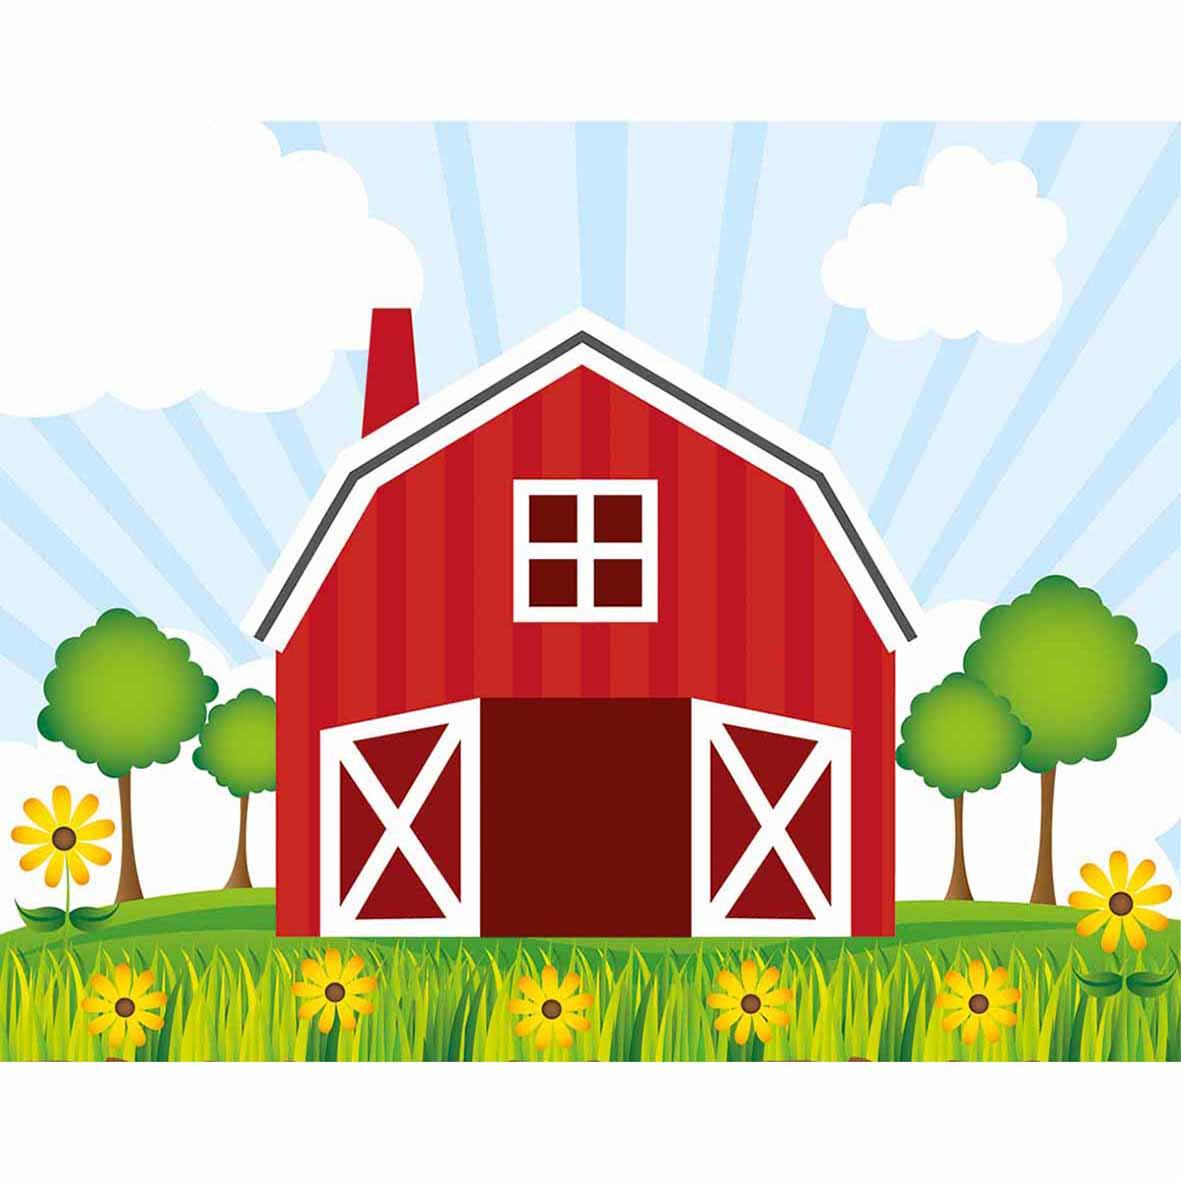 funnytree backgrounds for photo studio red barn cartoon farm kids